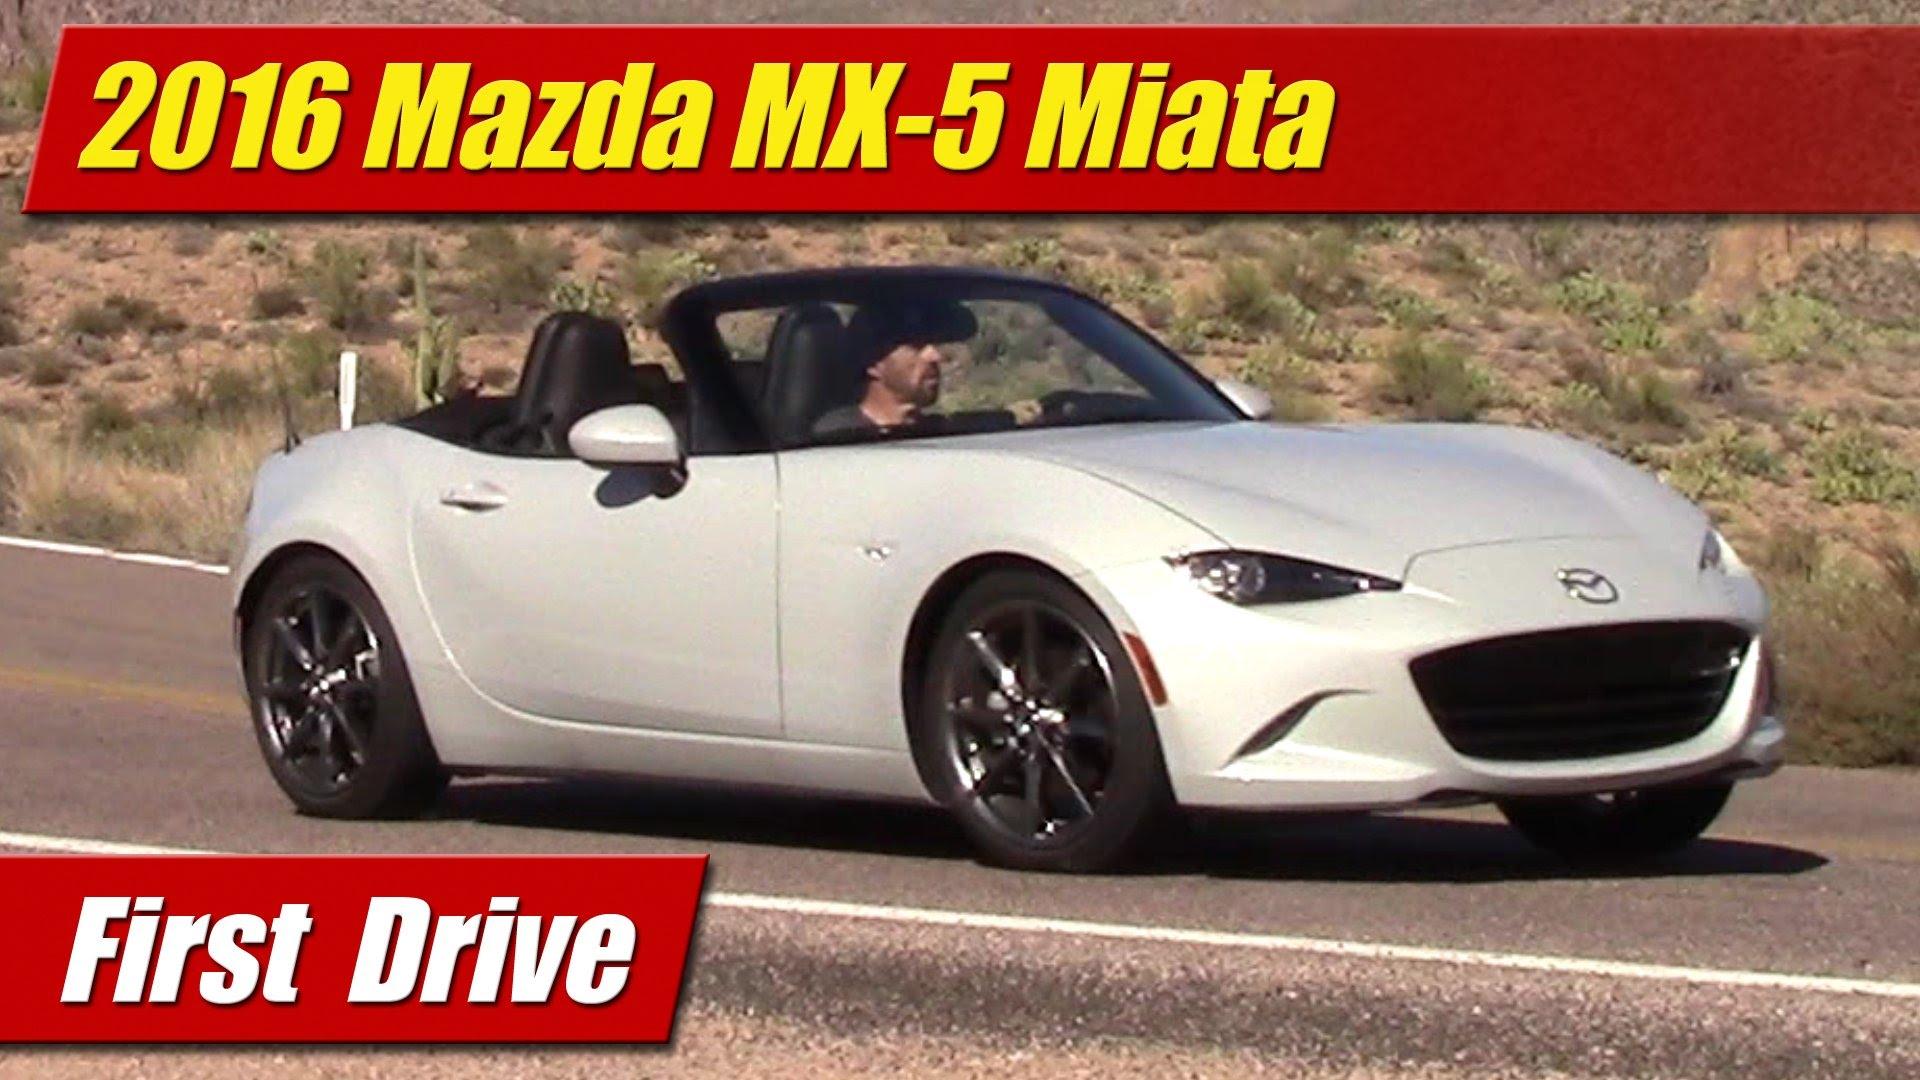 first drive review 2016 mazda mx 5 miata testdriven tv. Black Bedroom Furniture Sets. Home Design Ideas